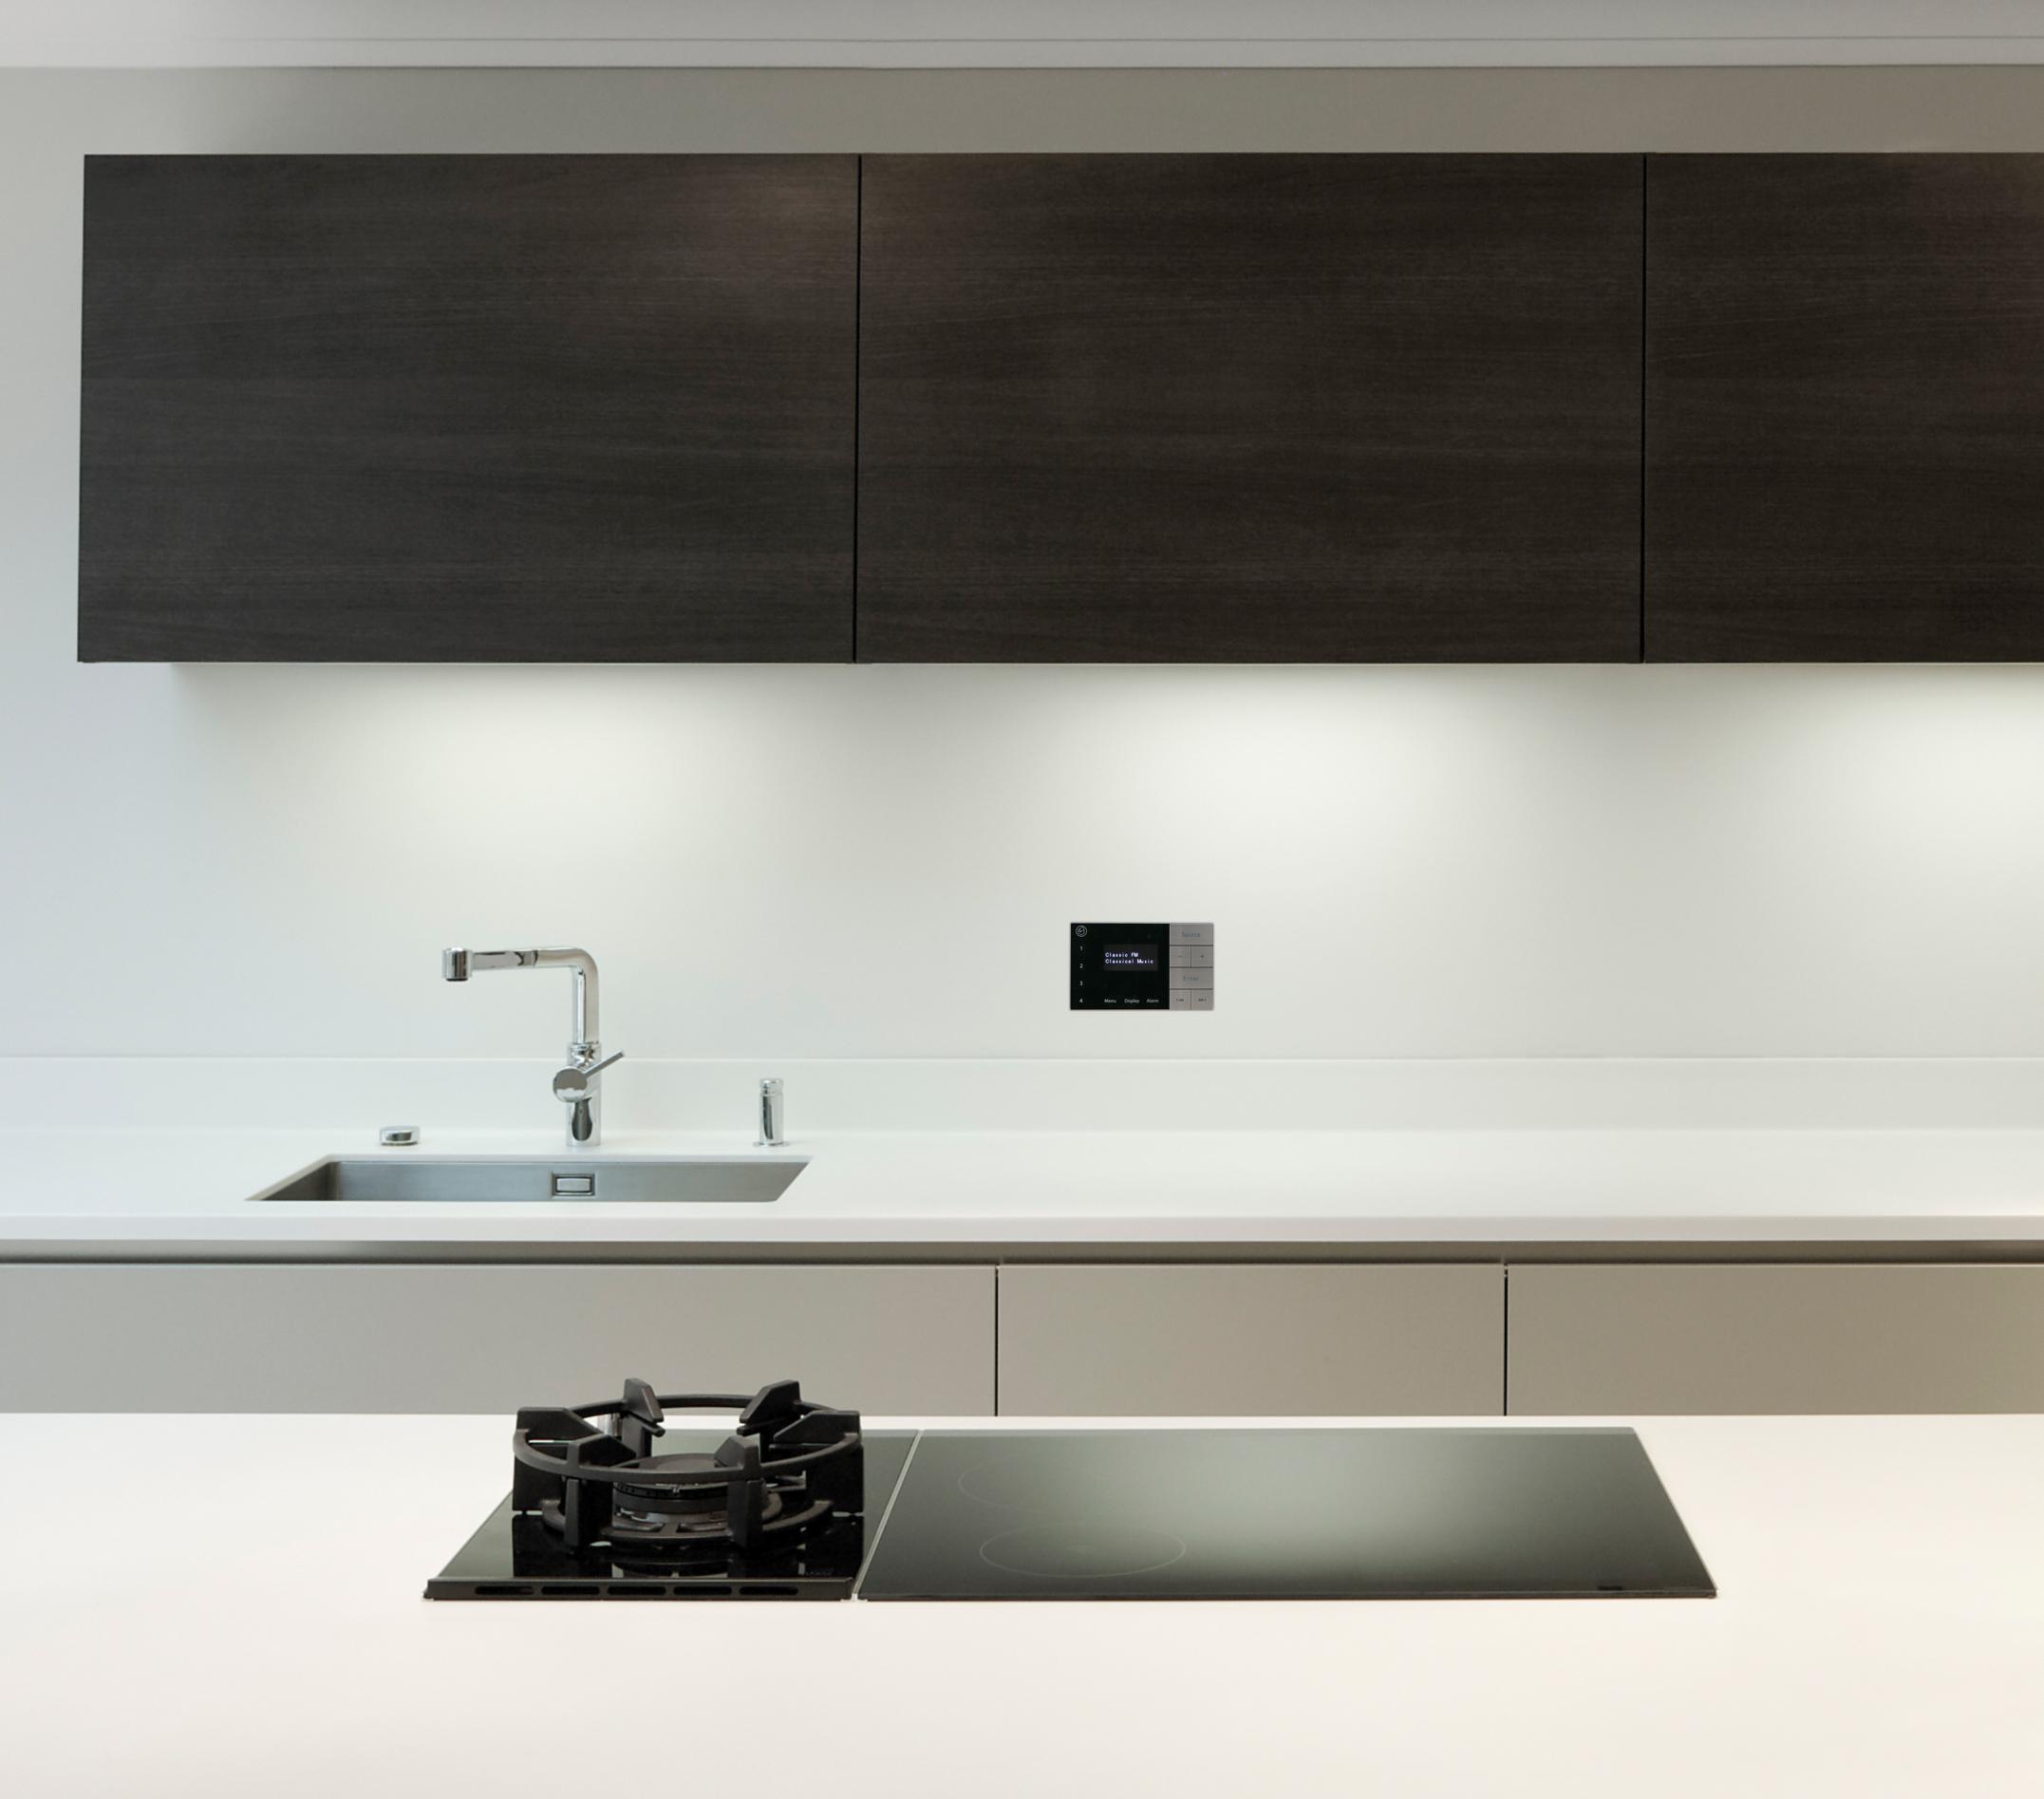 systemline e100 bluetooth fmdab radio create automation - Bathroom Radio